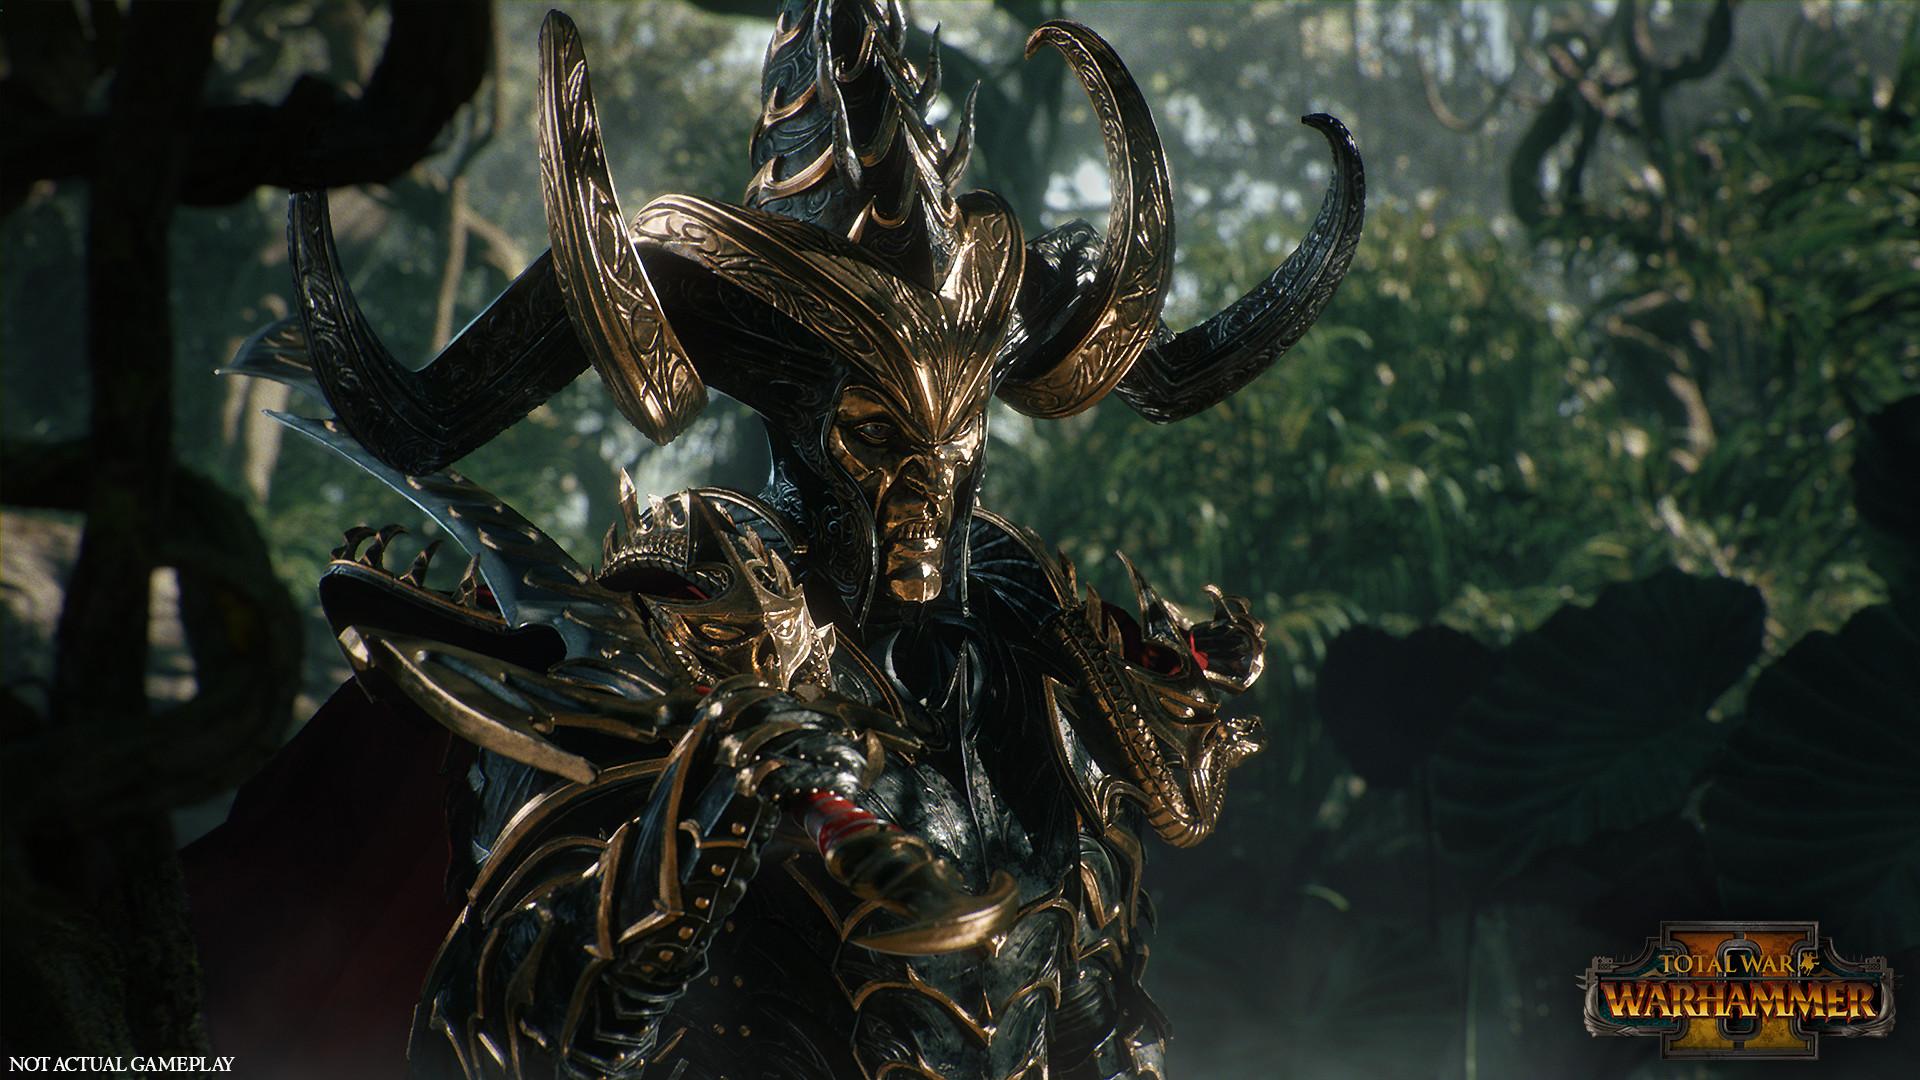 Total War - Warhammer 2 - Hexenkönigs Malekith - Dunkelelfen